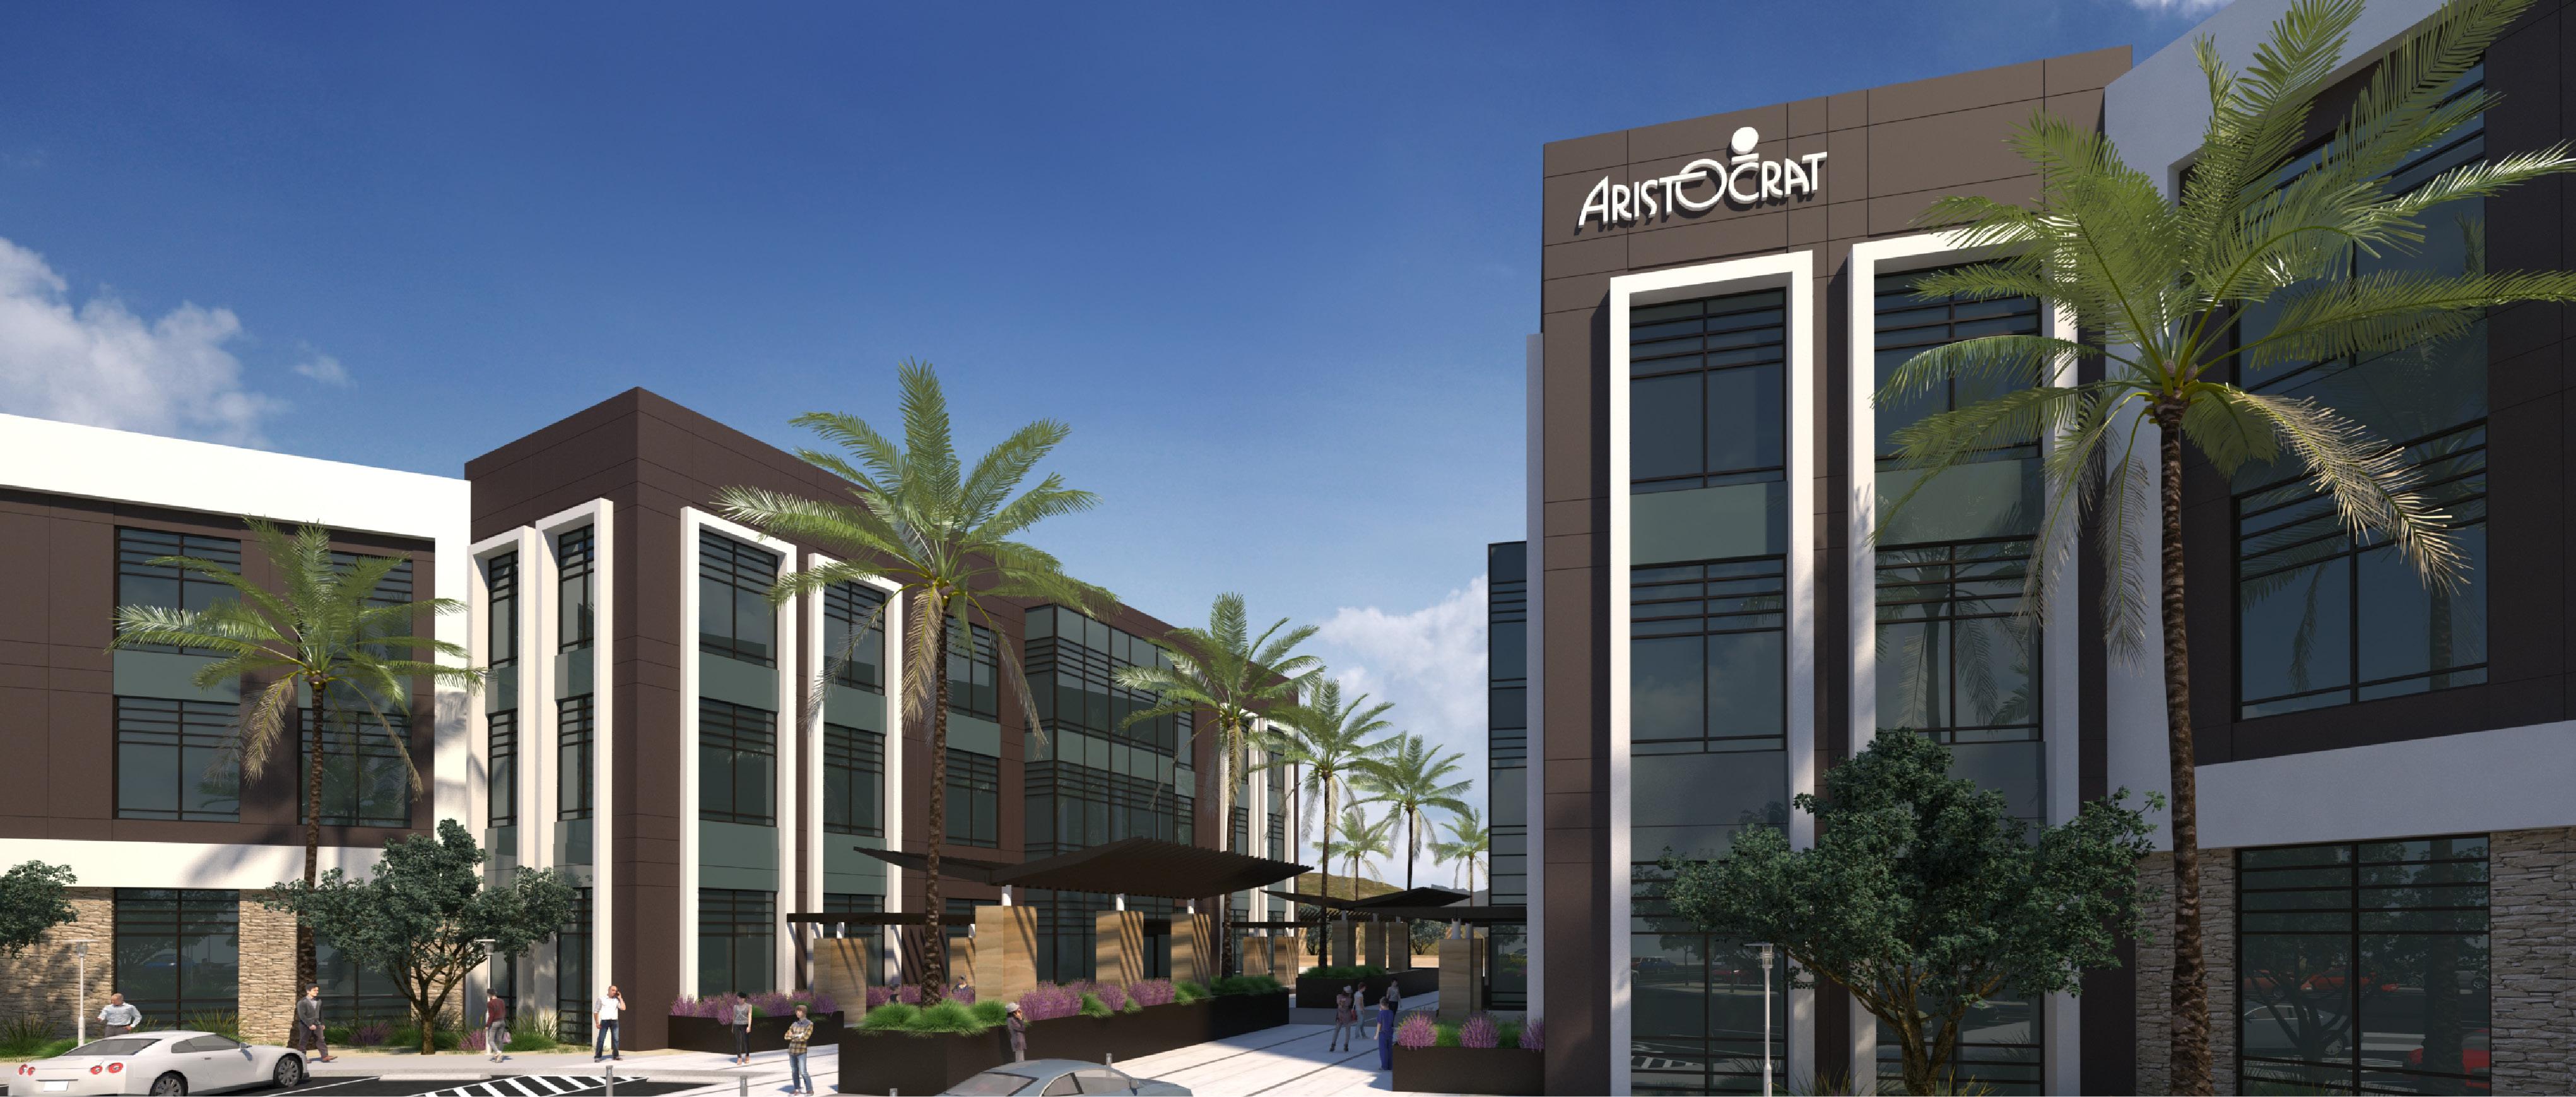 Aristocrat Technologies